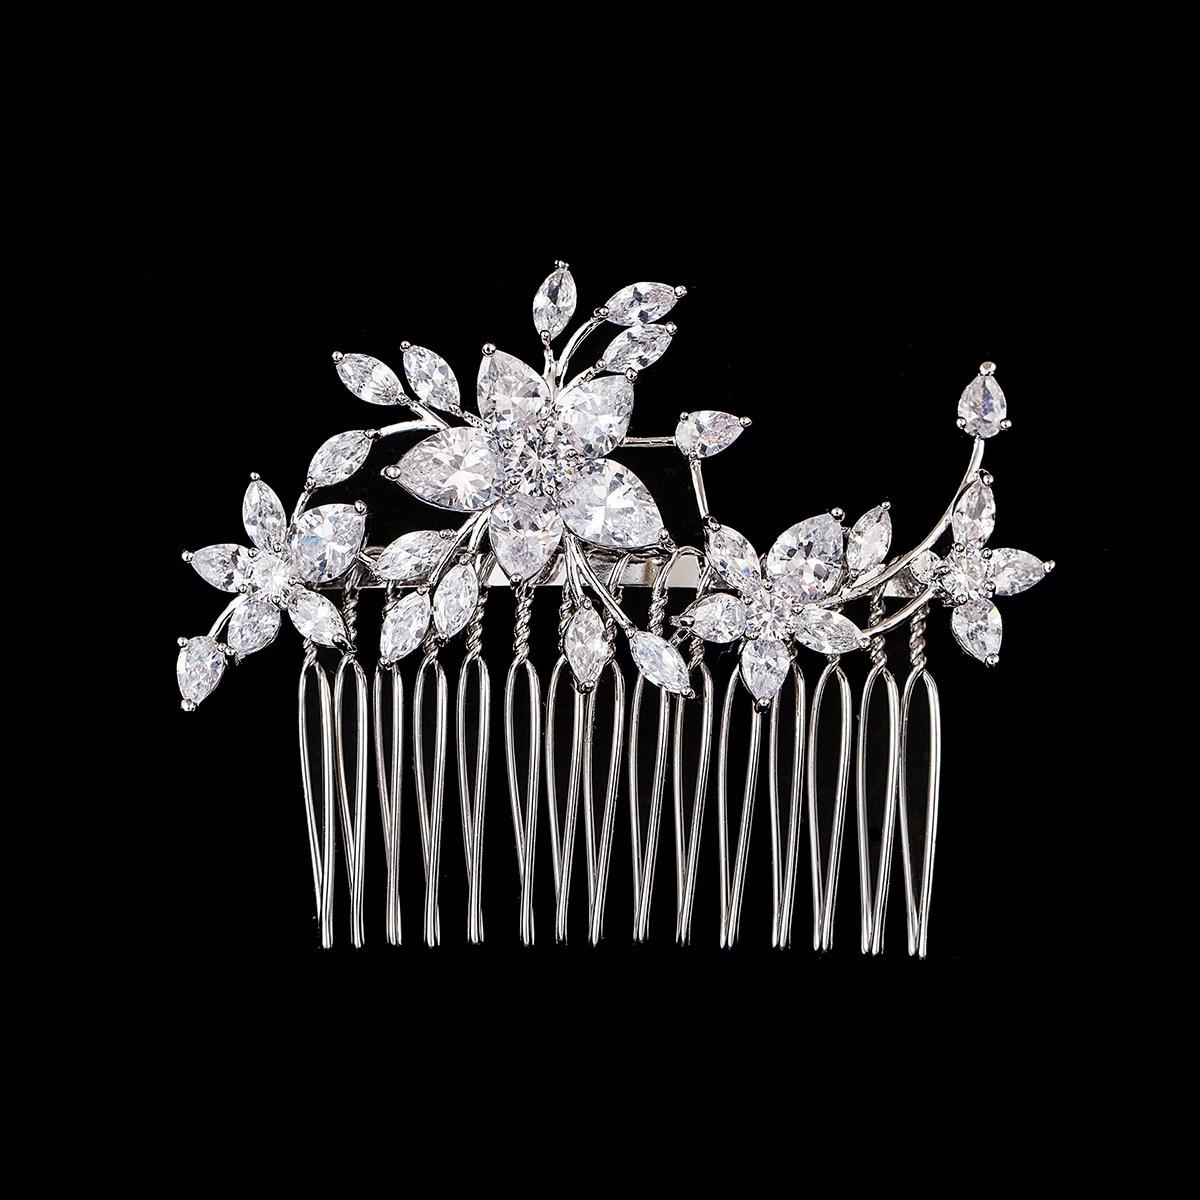 Cubic Zirconia Hair Comb Flower Clip CZ Women Hair Jewelry For Bride Wedding Hair Accessories Pince Cheveux 5.8x7.4cm WIGO1082 цена